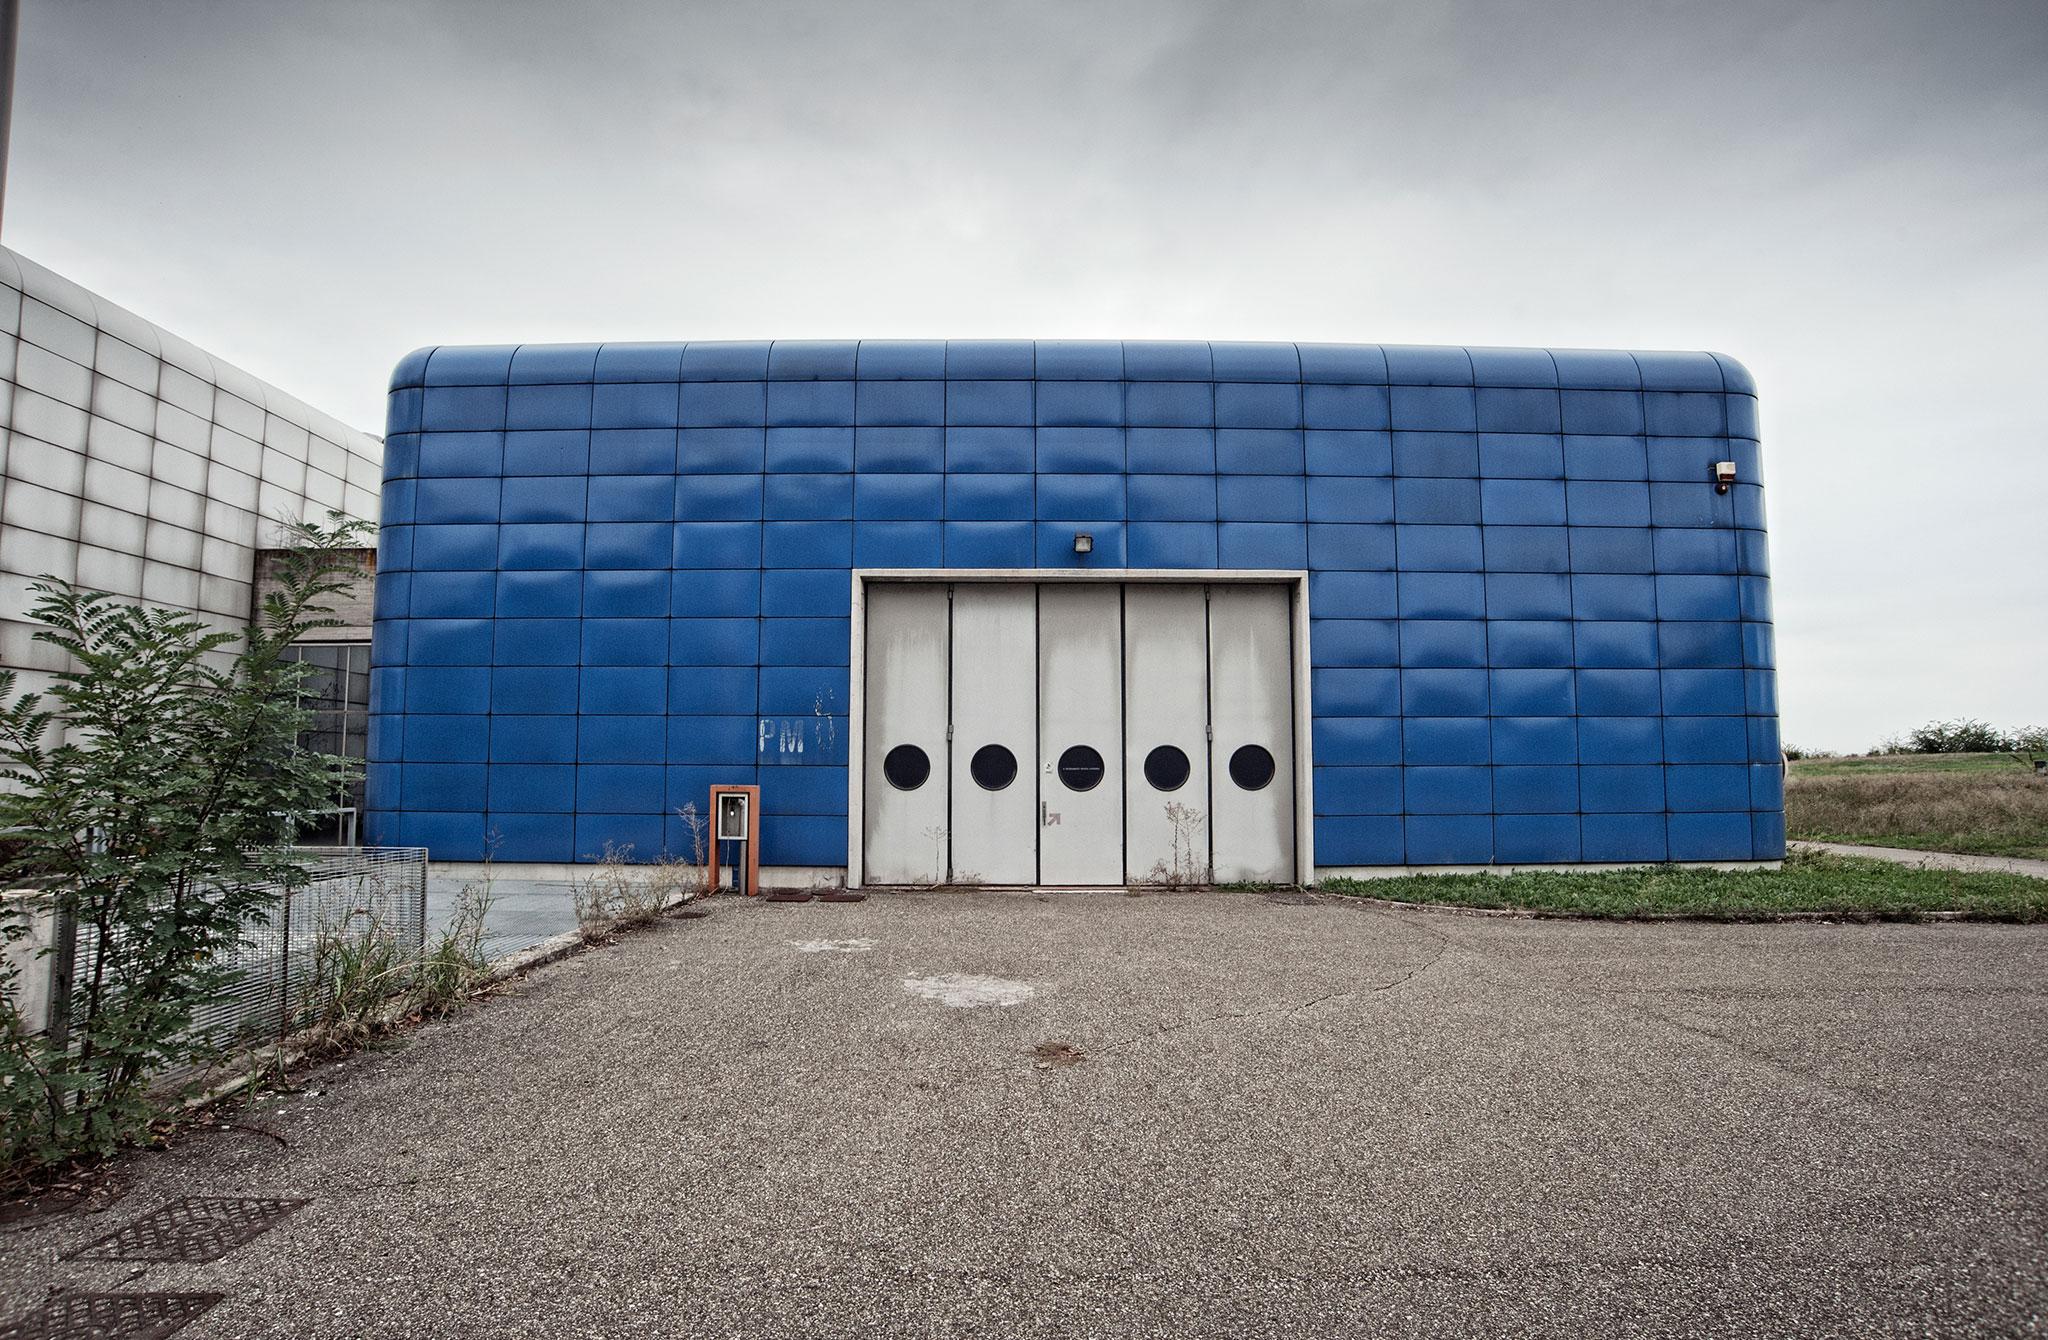 Take a Look Inside the Forgotten Bugatti SpA Headquarters in Italy